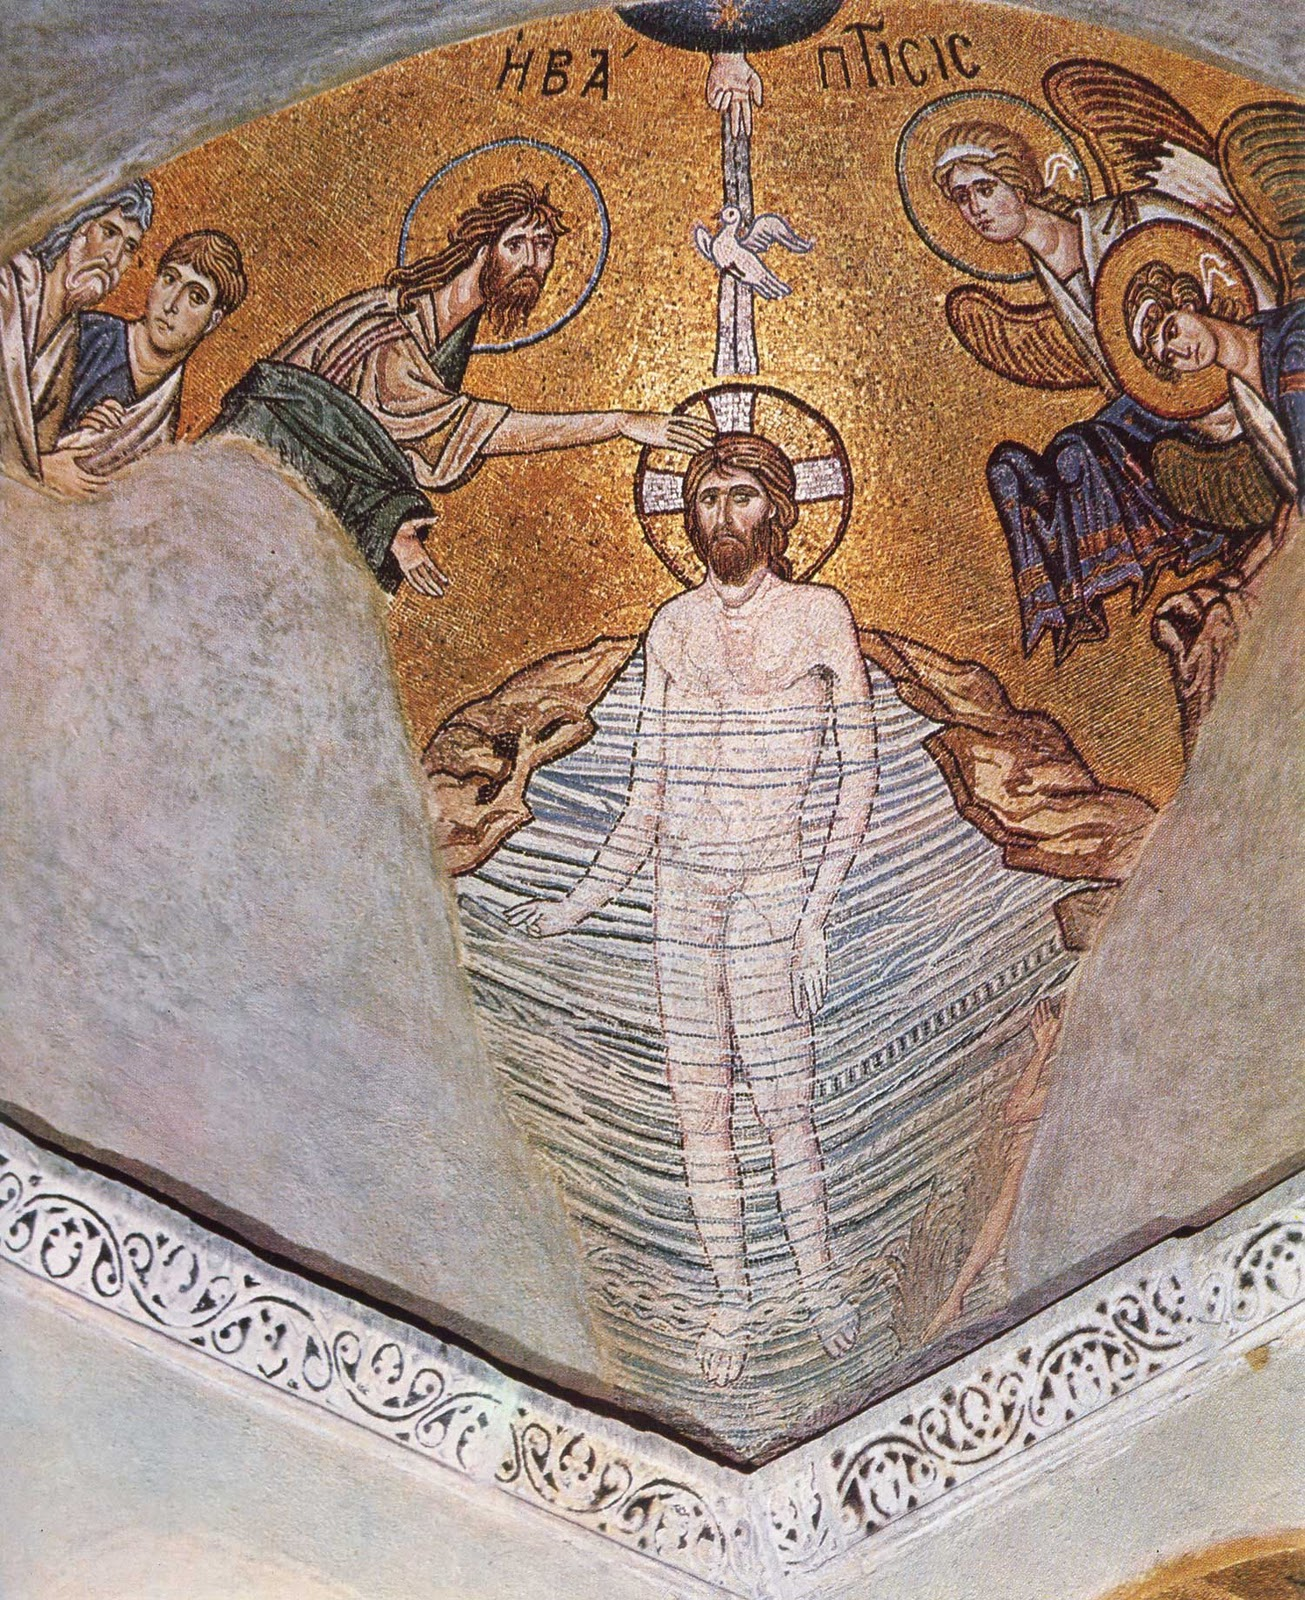 http://www.pravmir.ru/wp-content/uploads/2012/01/baptism-11th-cent-Greek-mosaic.jpg